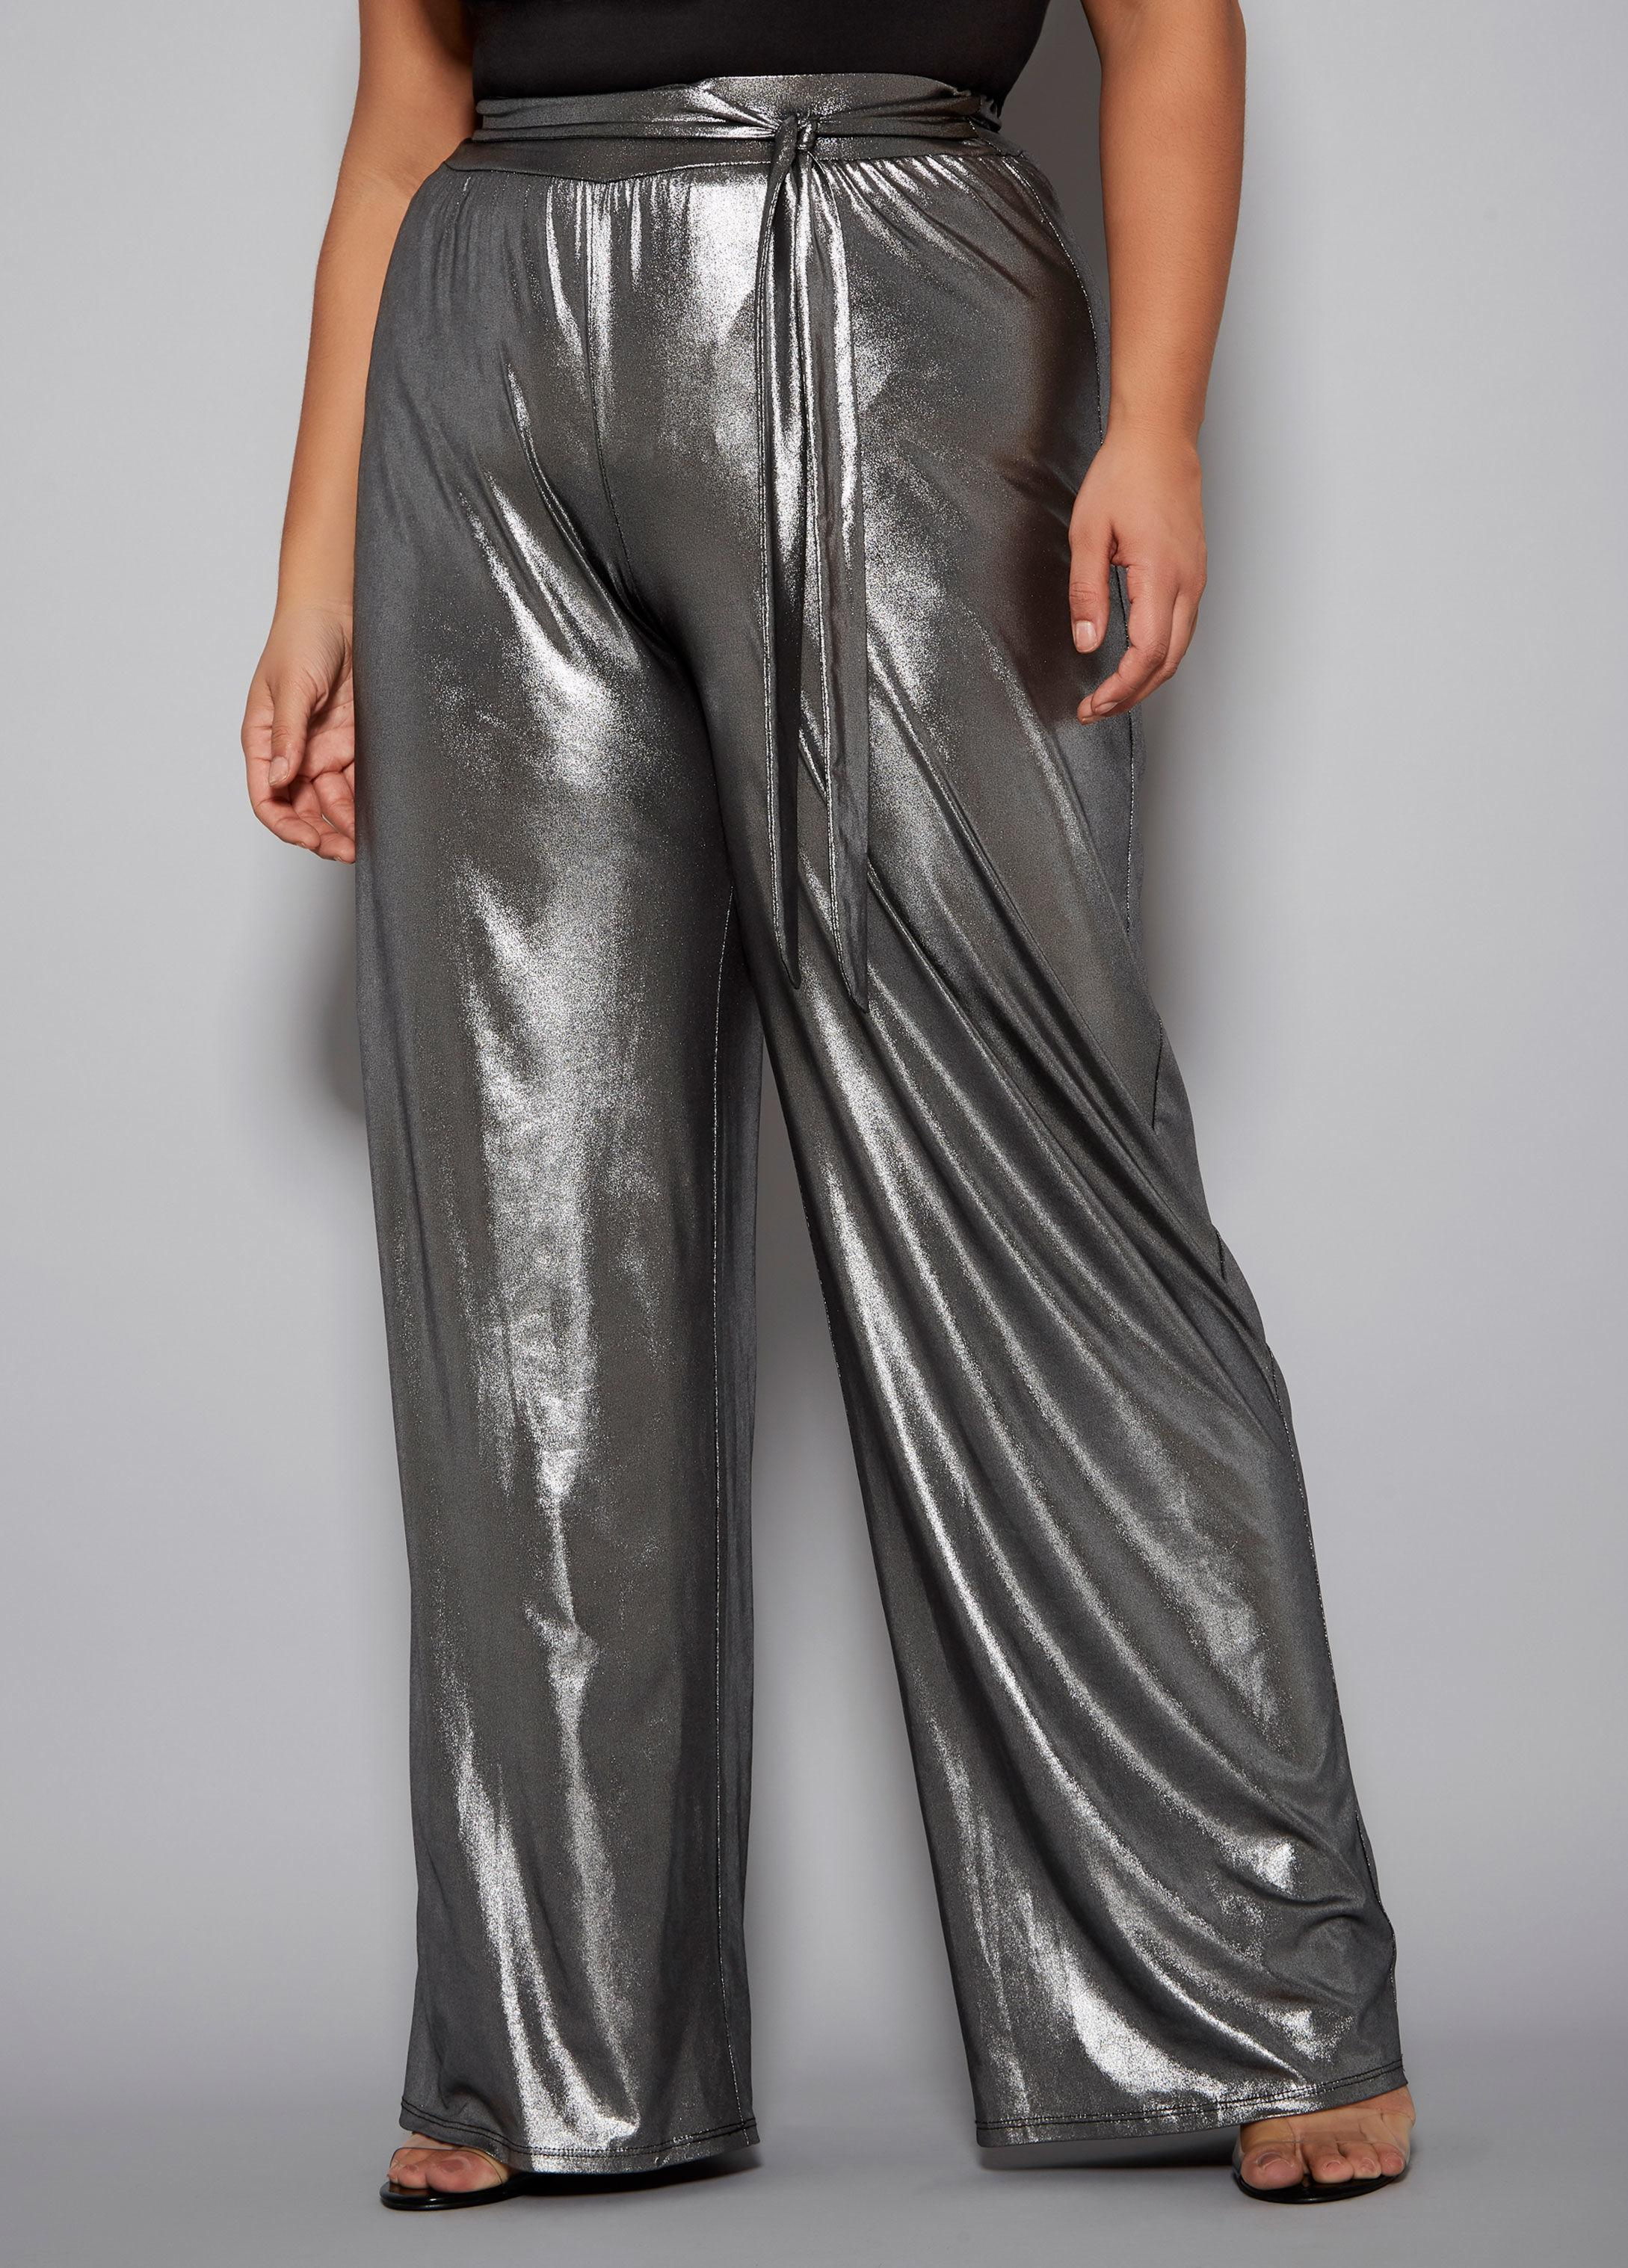 cdbaa7986171f Lyst - Ashley Stewart Plus Size The Sienna Pant in Metallic